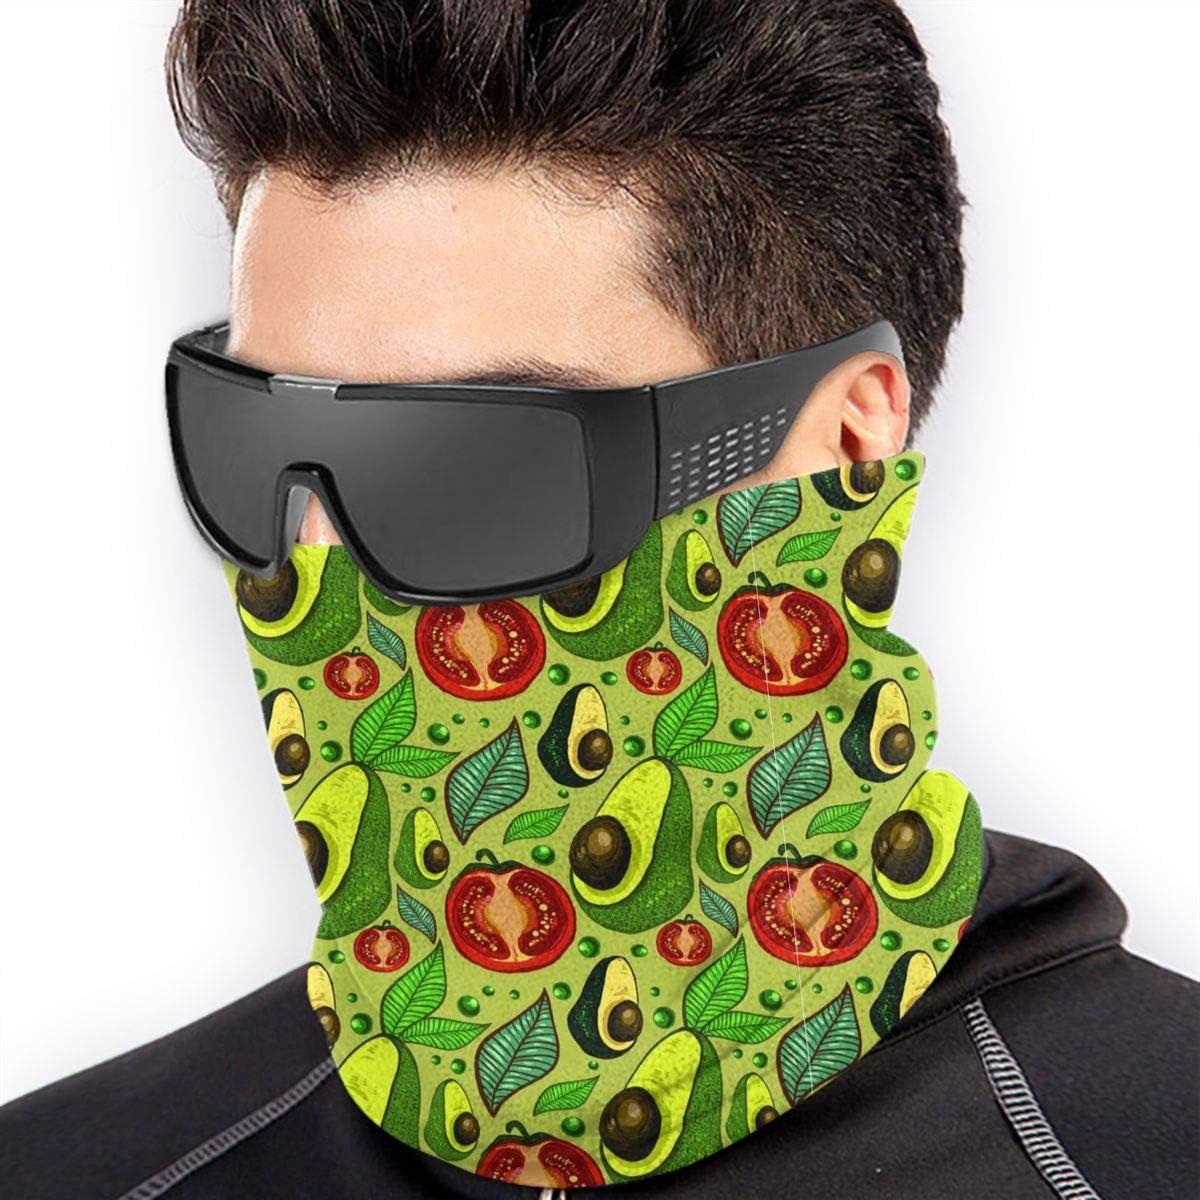 Vegetables Avocado Tomato Peas Neck Warmer Gaiter For Men Women Headband Face Mask Bandana Head Wrap Scarf Headwear Winter Balaclava For Ski Running Motorcycle